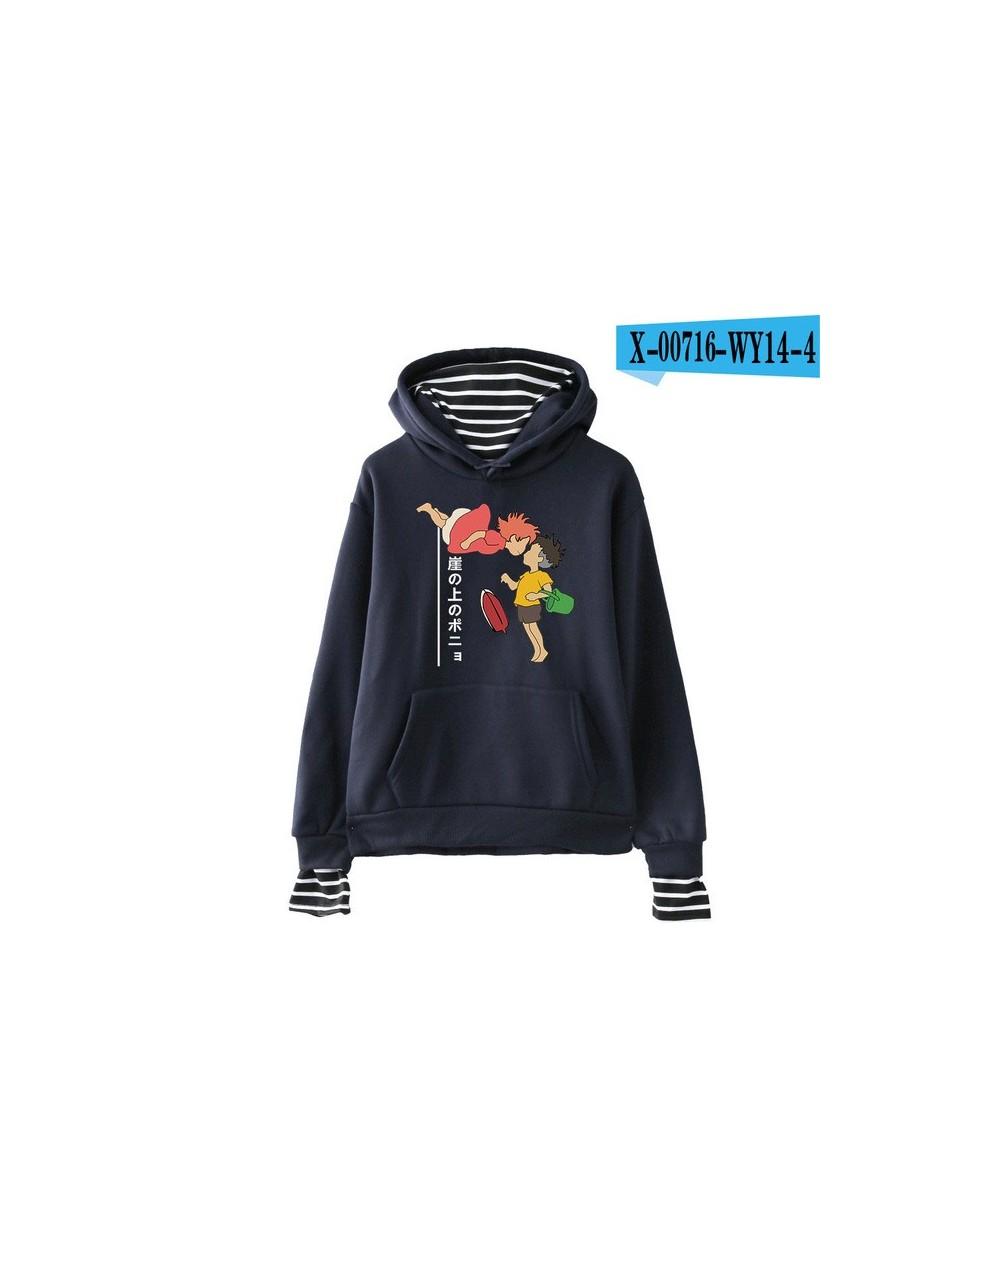 Fashion Printed Harajuku Fake Two Piece Hoodies Women Long Sleeve Hooded Sweatshirt 2019 Hot Sale Autumn Ladies Casual Cloth...